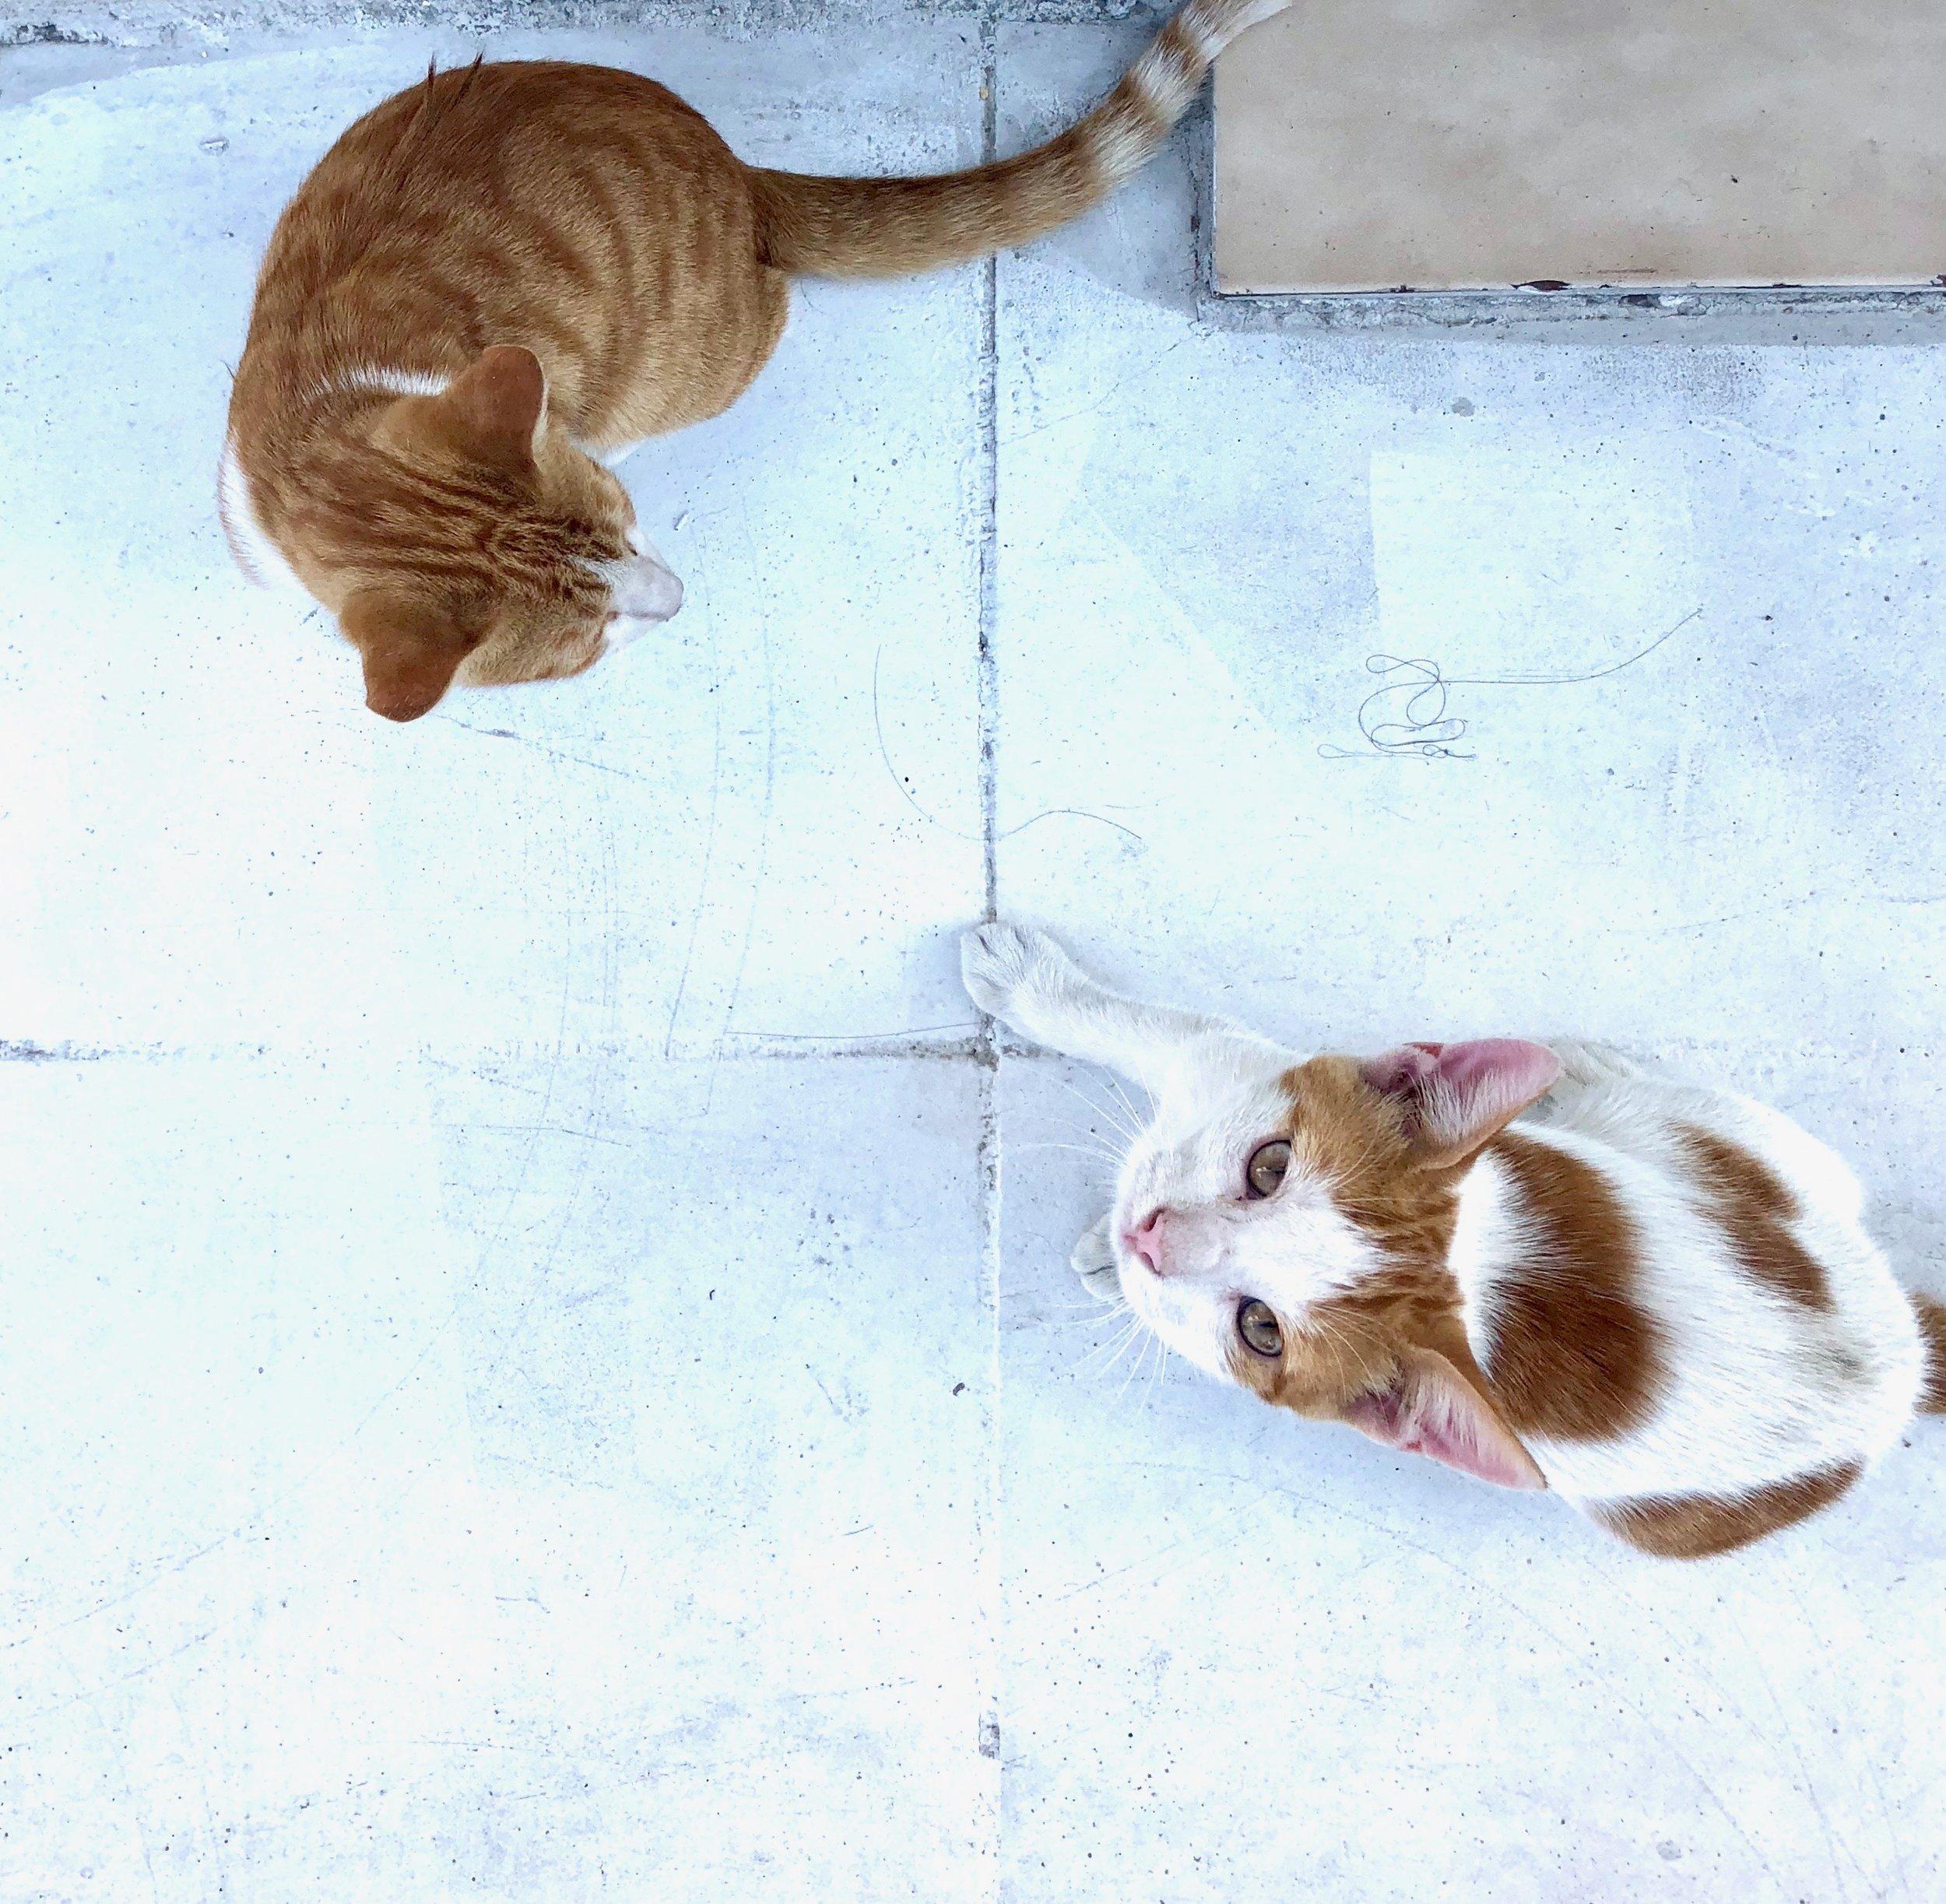 vegan kittens in greece